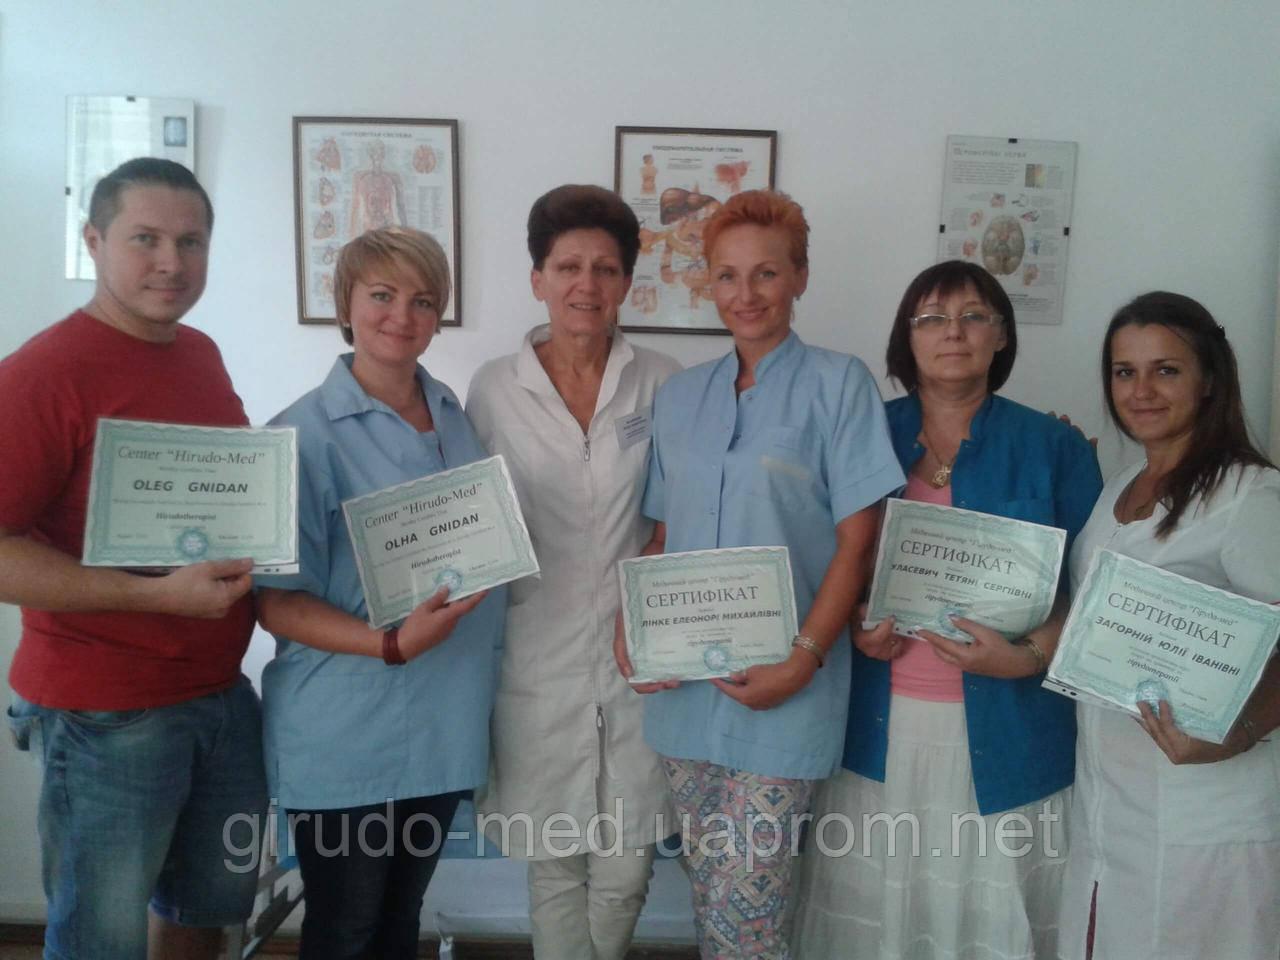 Szkolenia hirudoterapii  .Курсы гирудотерапии  Украина